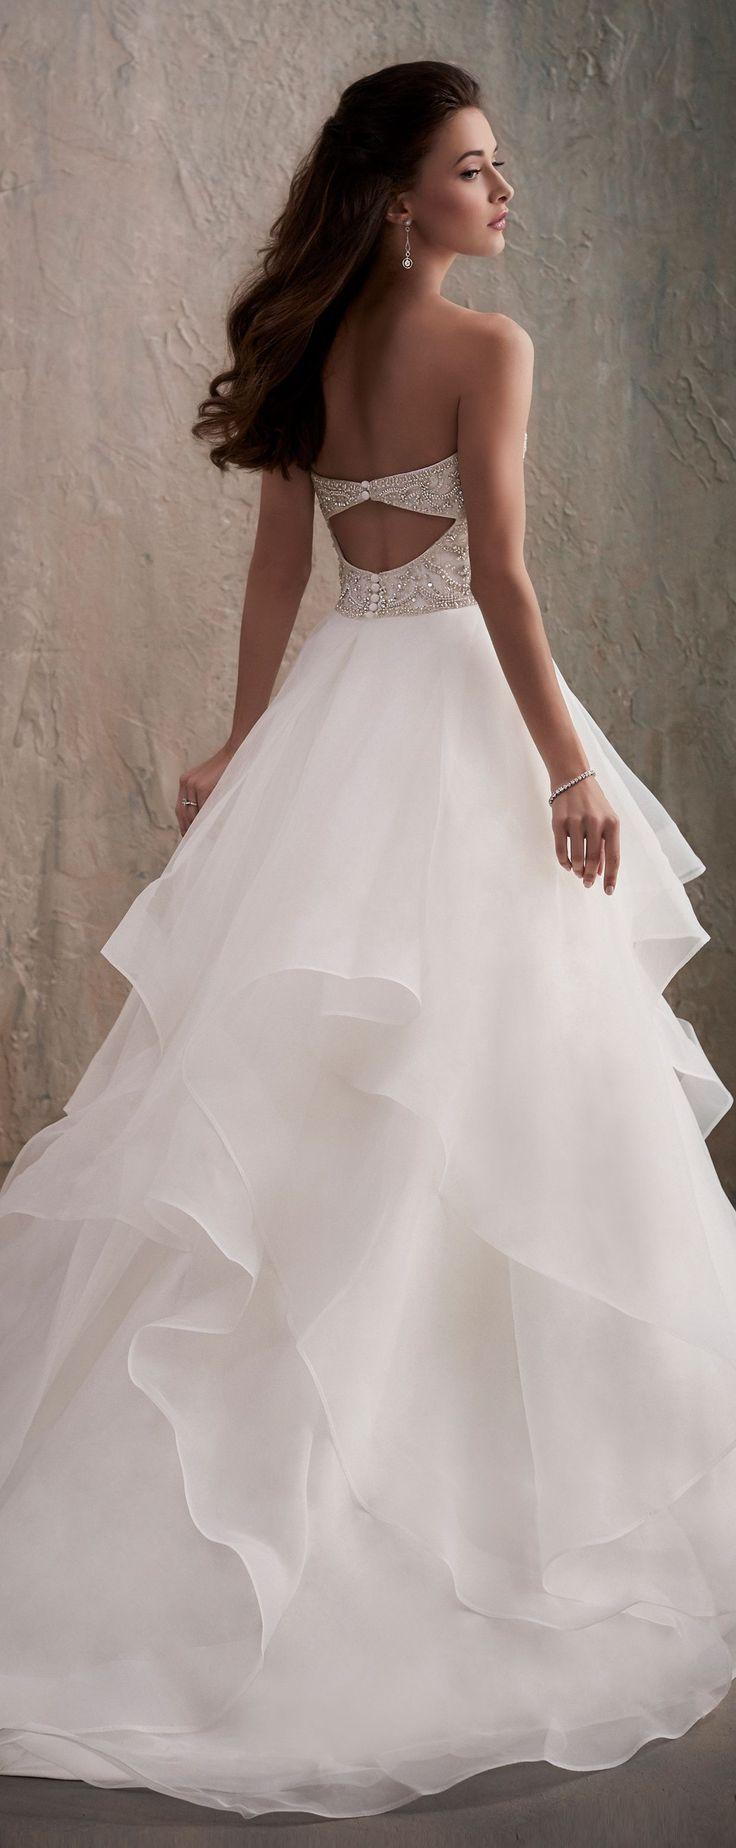 Wedding Dress By Adrianna Papell Platinum